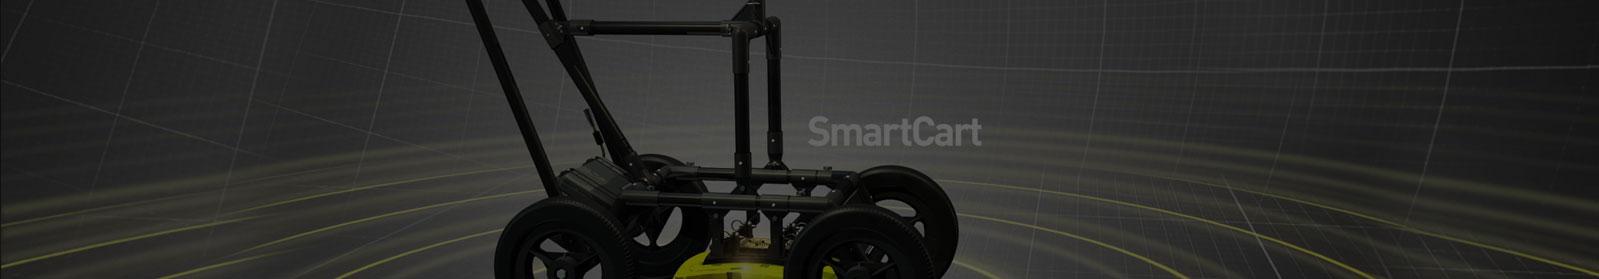 Sensors & Software